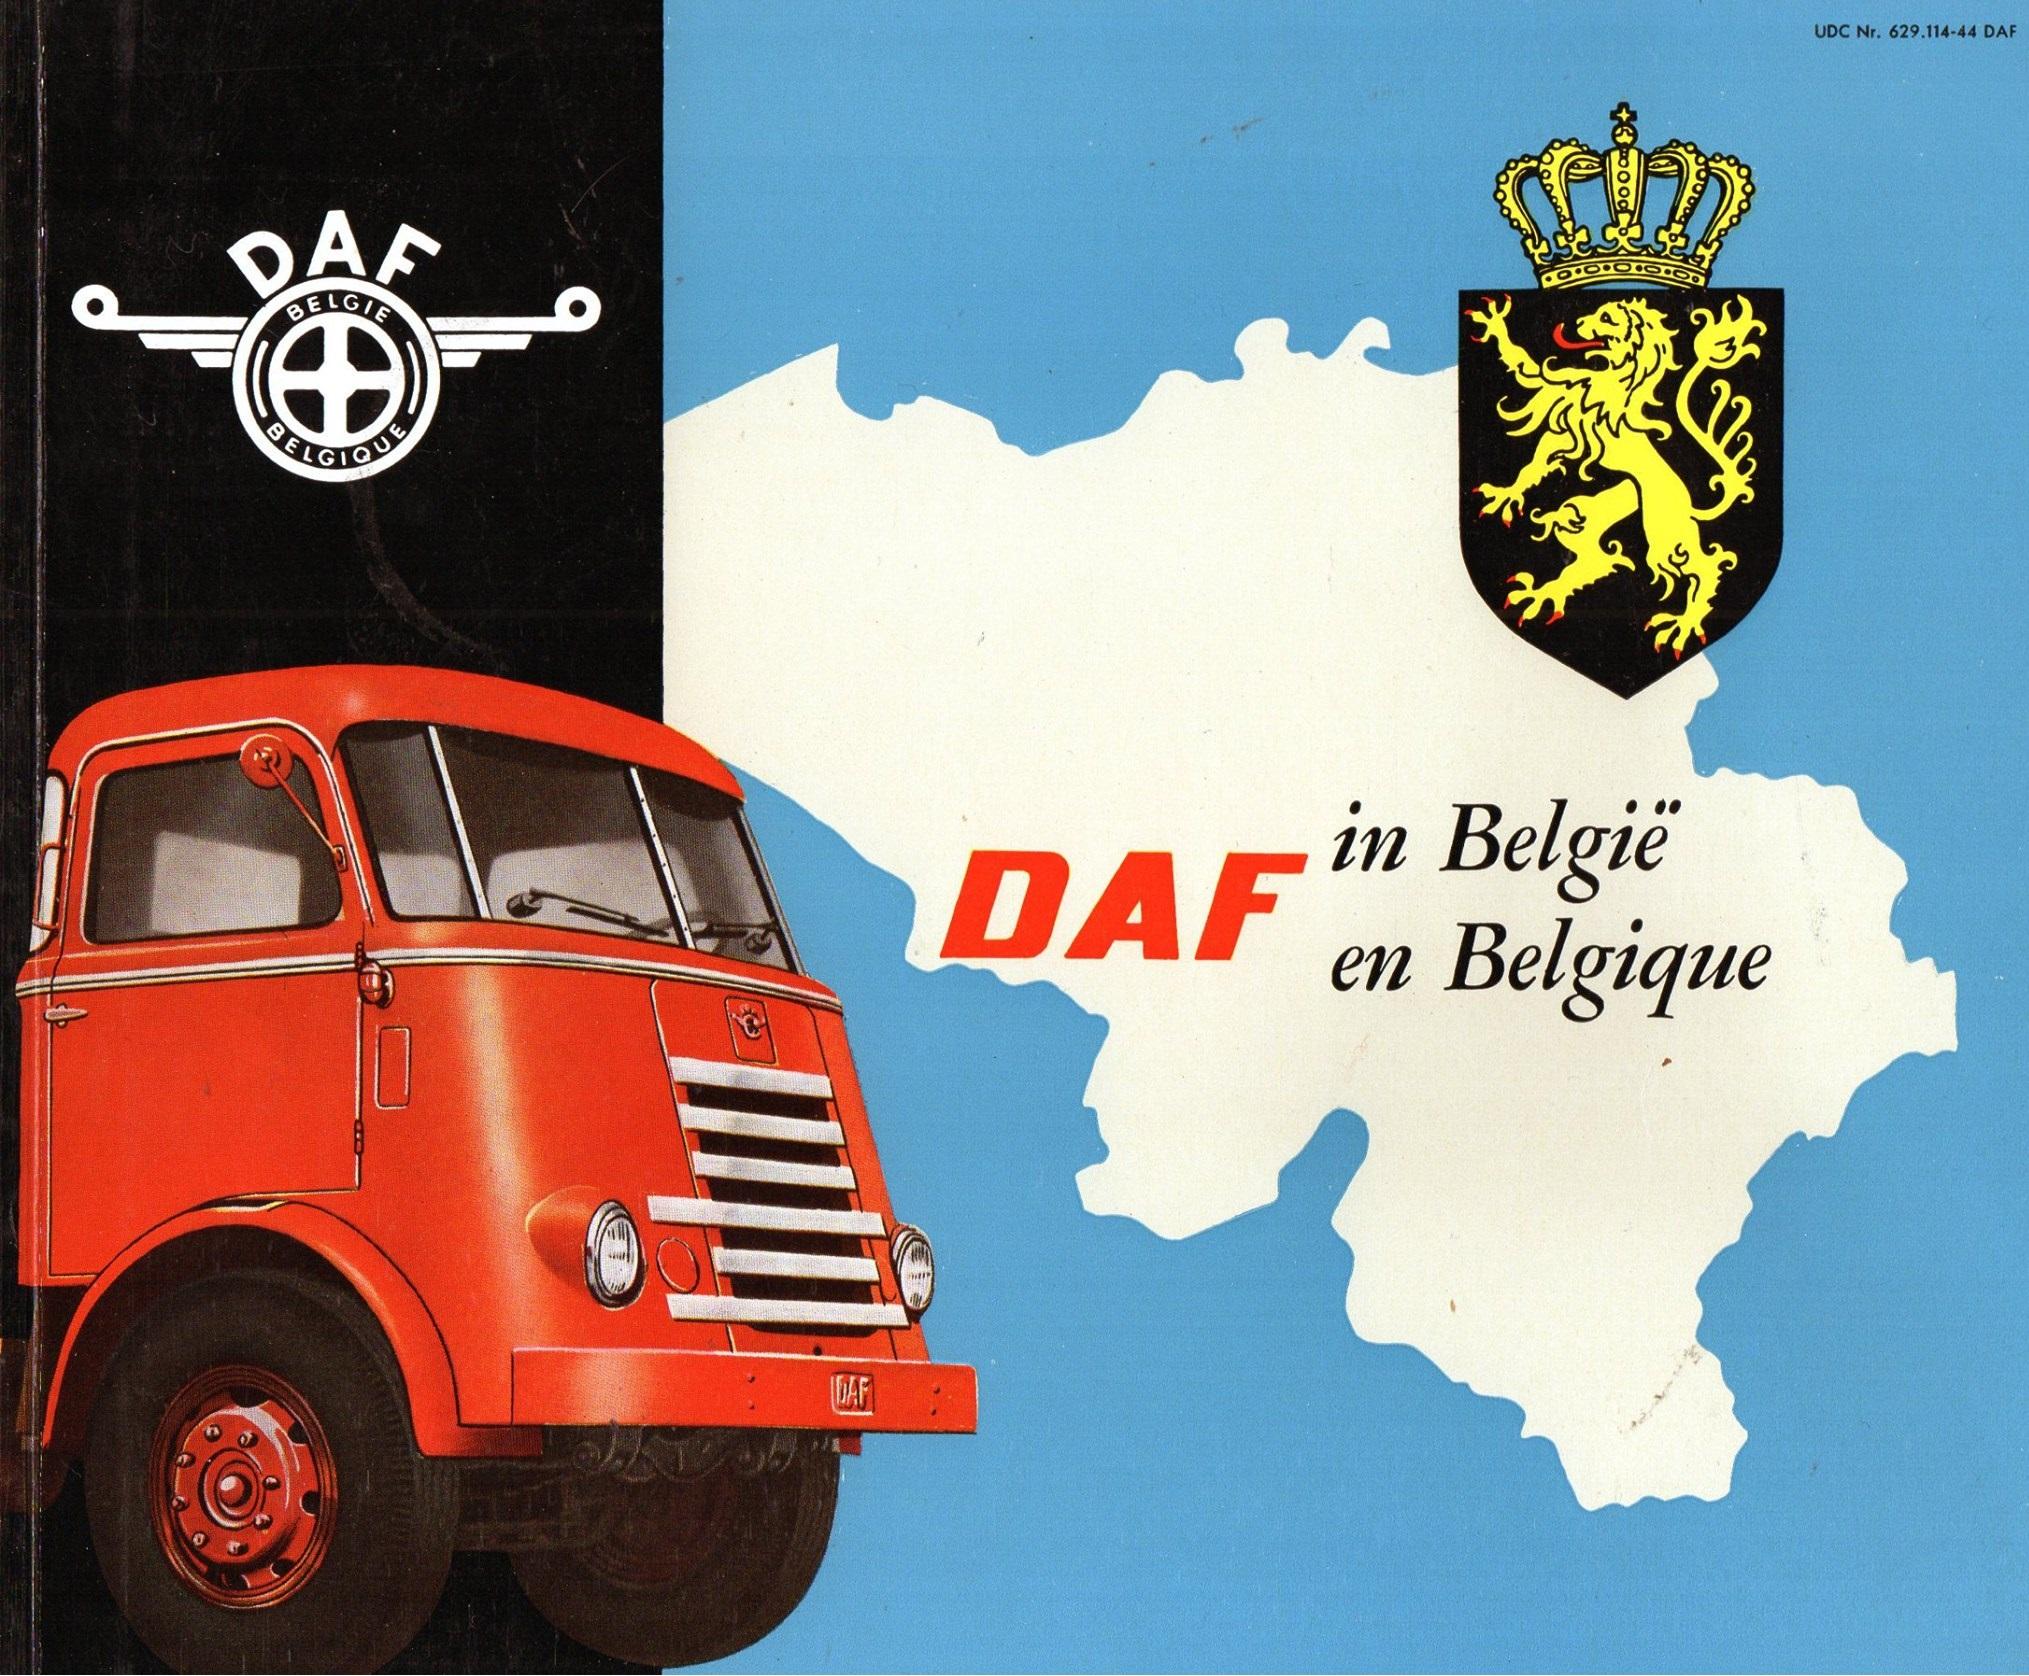 Daf-Blad-Belgie-archief-Ronny-Billiauw-2